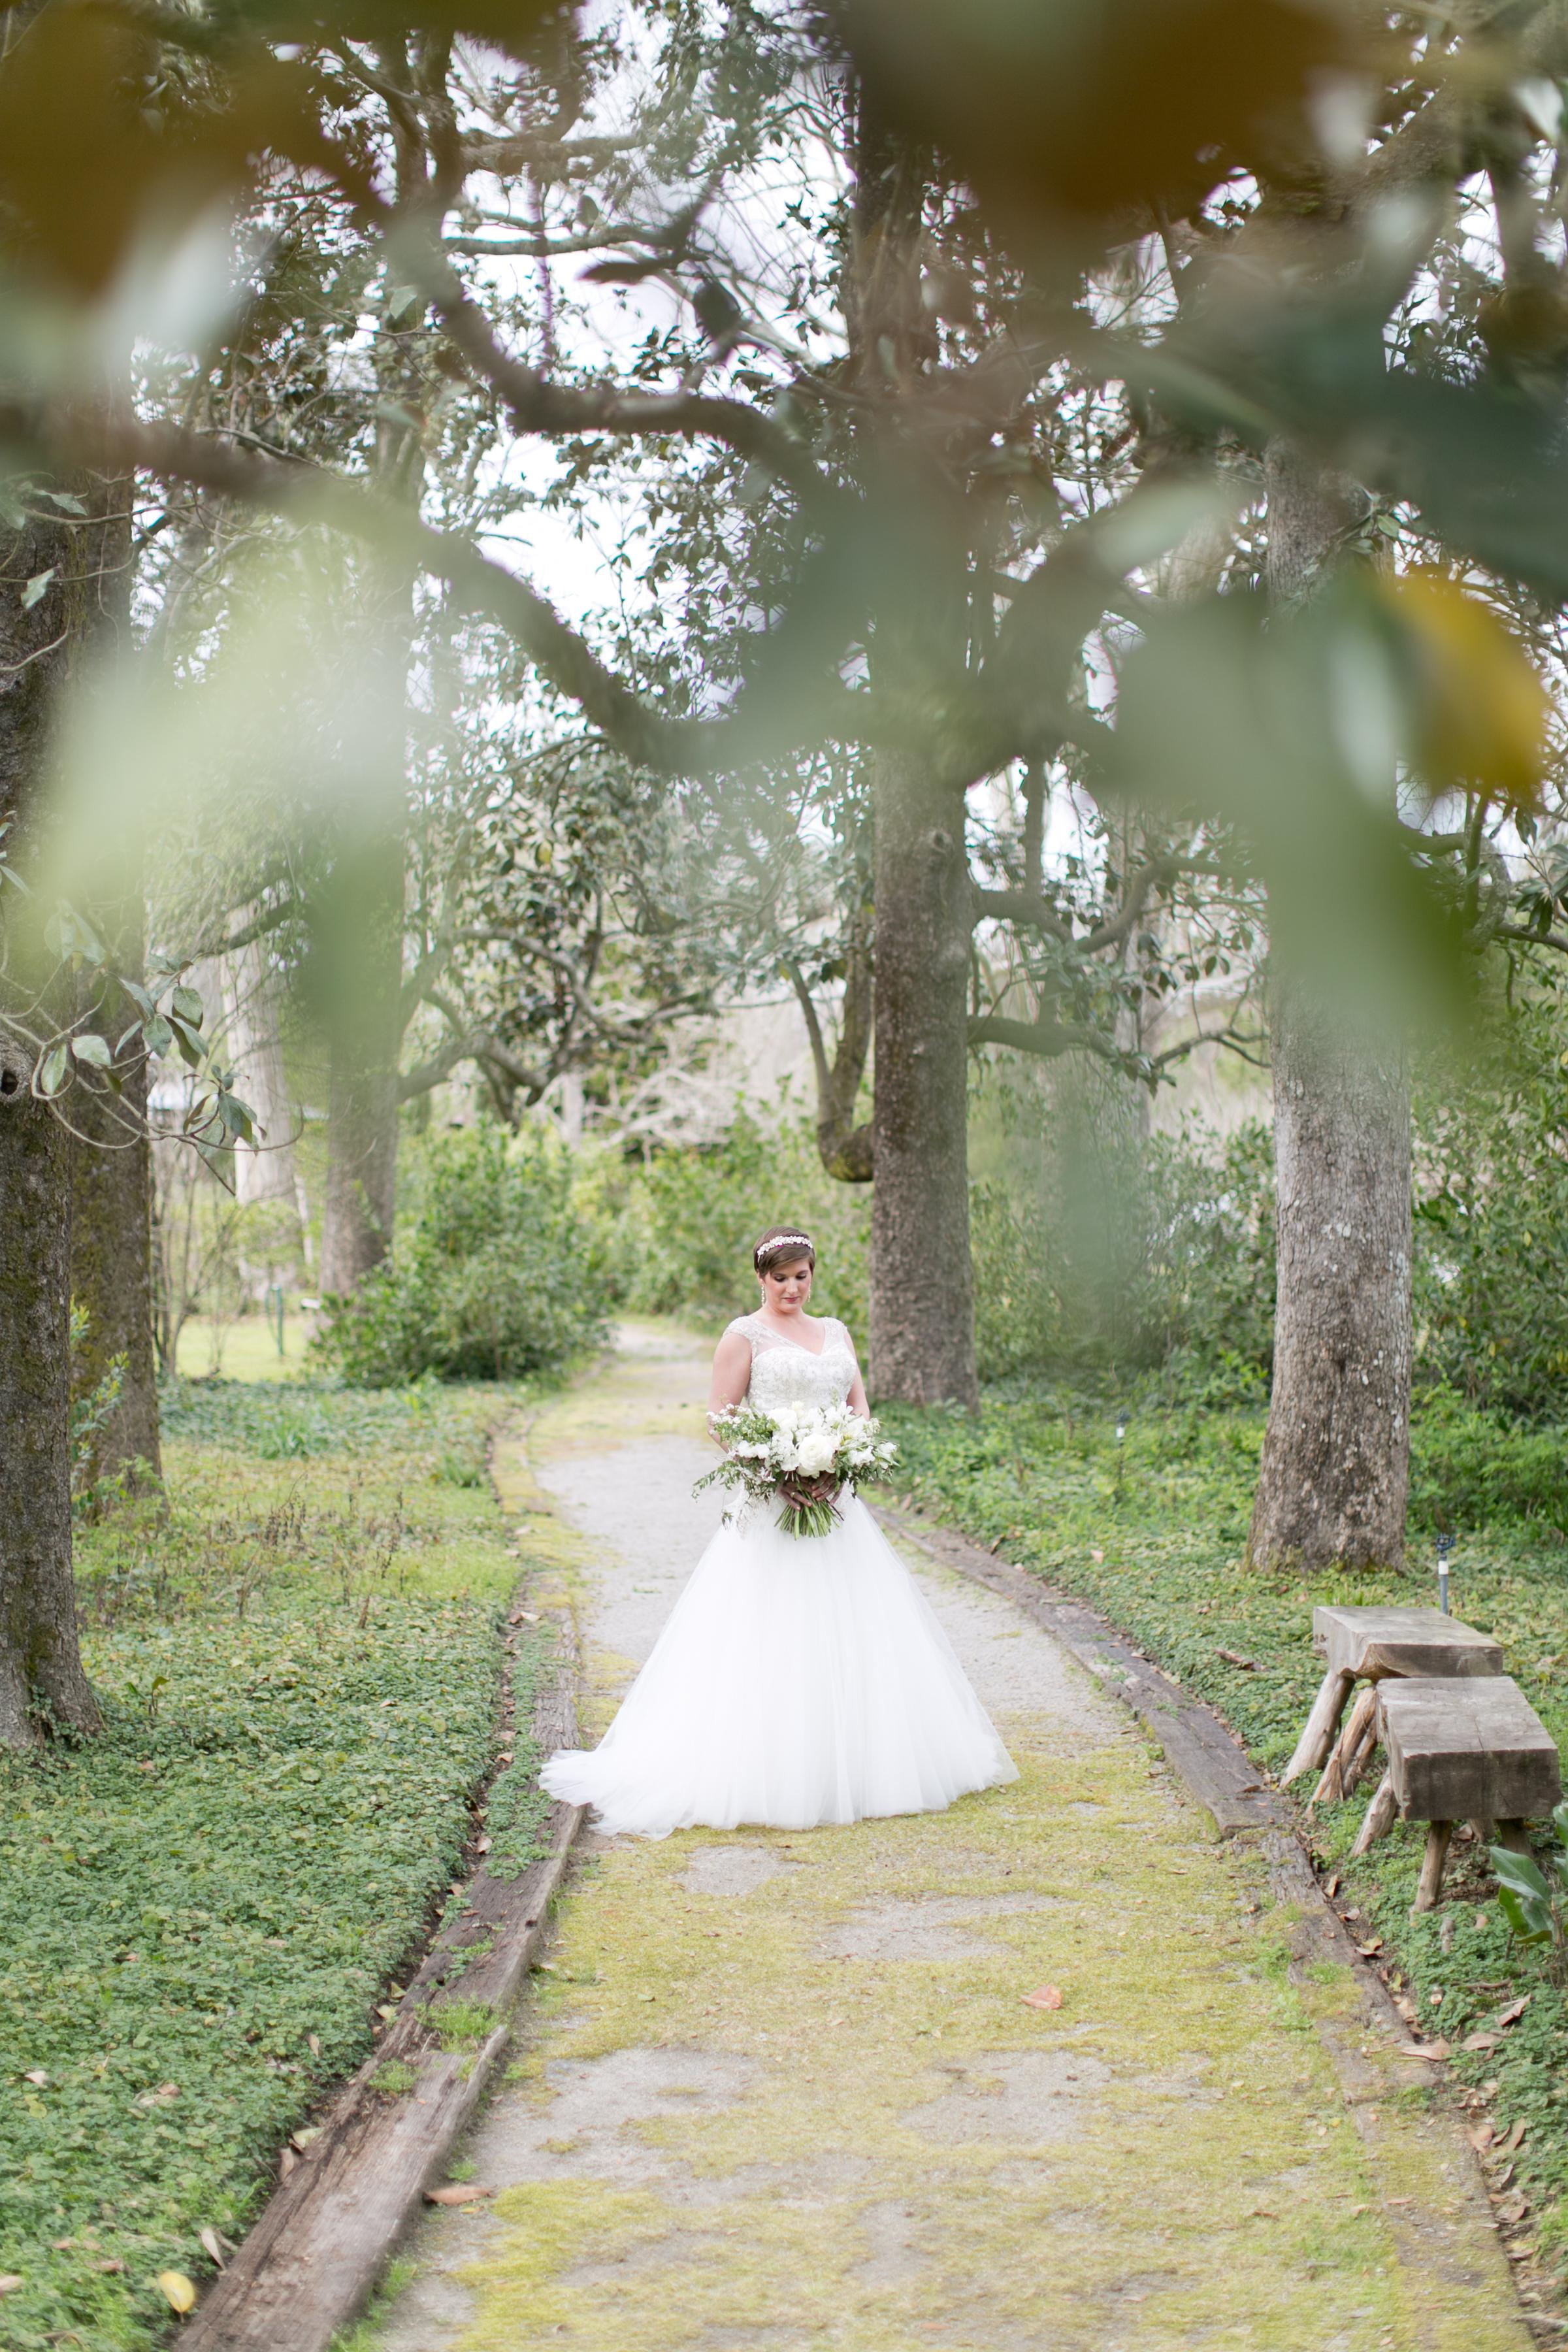 wavering_place_wedding12.jpg